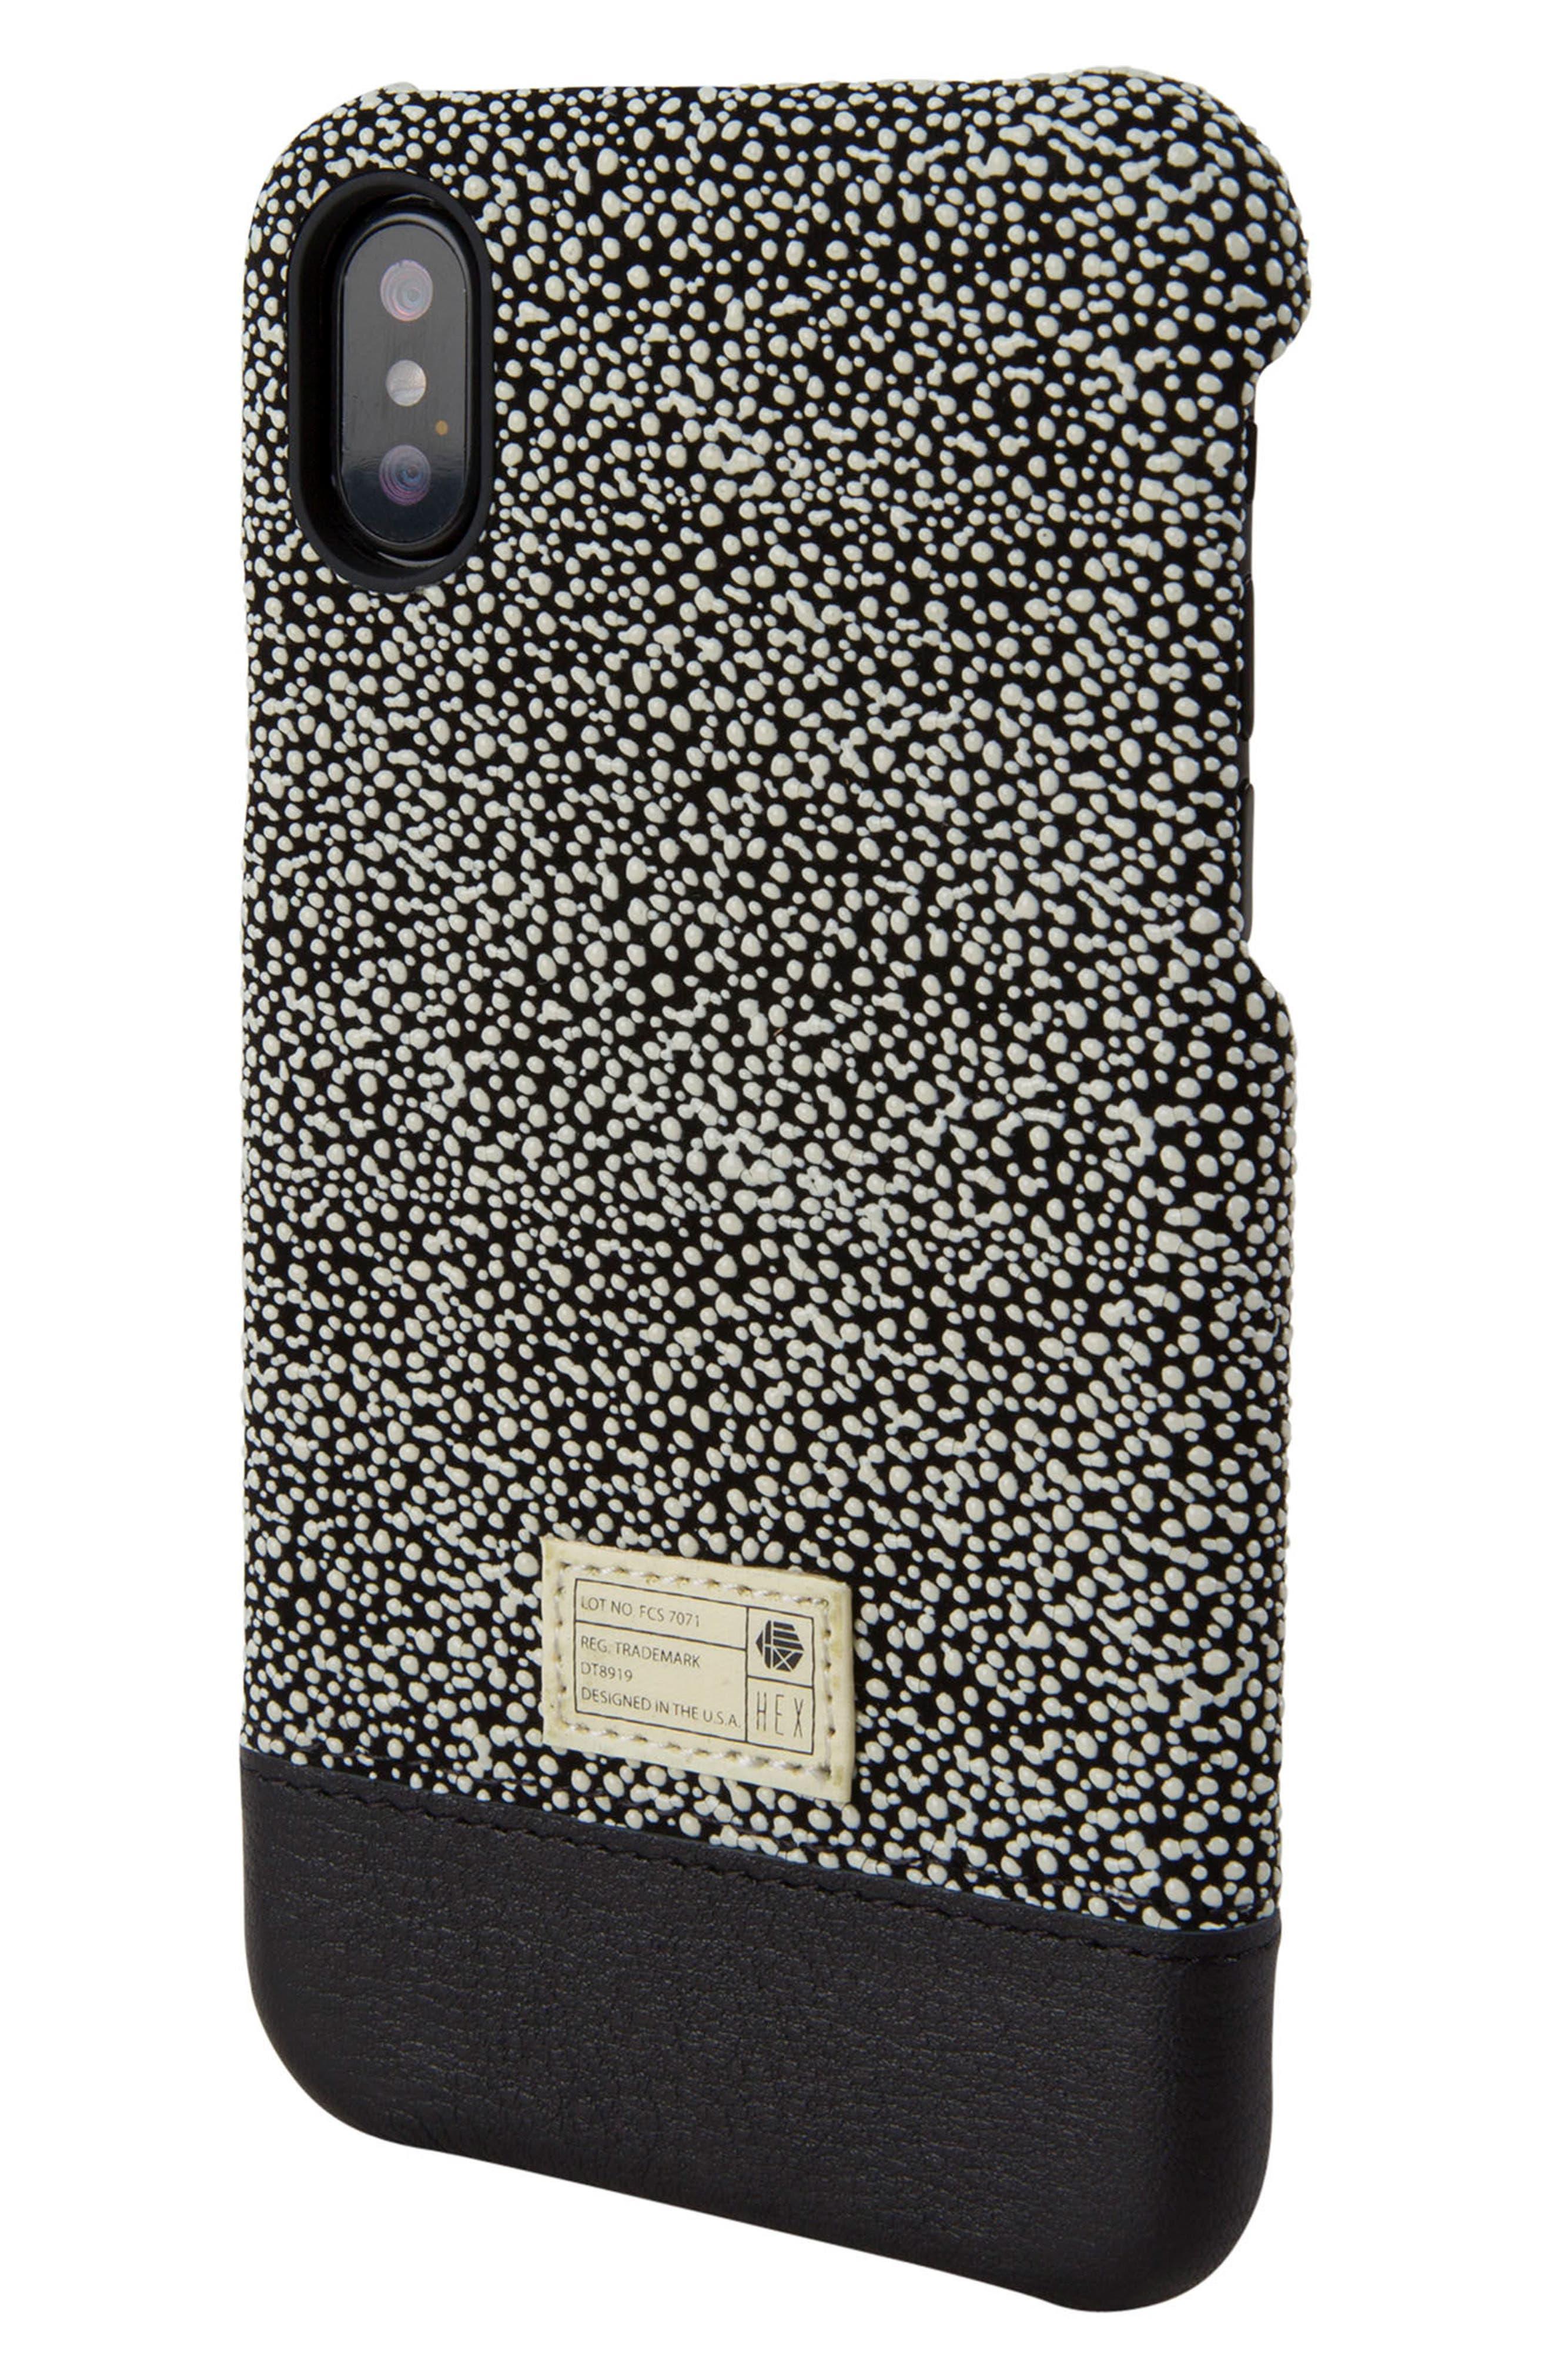 Focus Leather iPhone X Case,                         Main,                         color, Black/ White Stingray